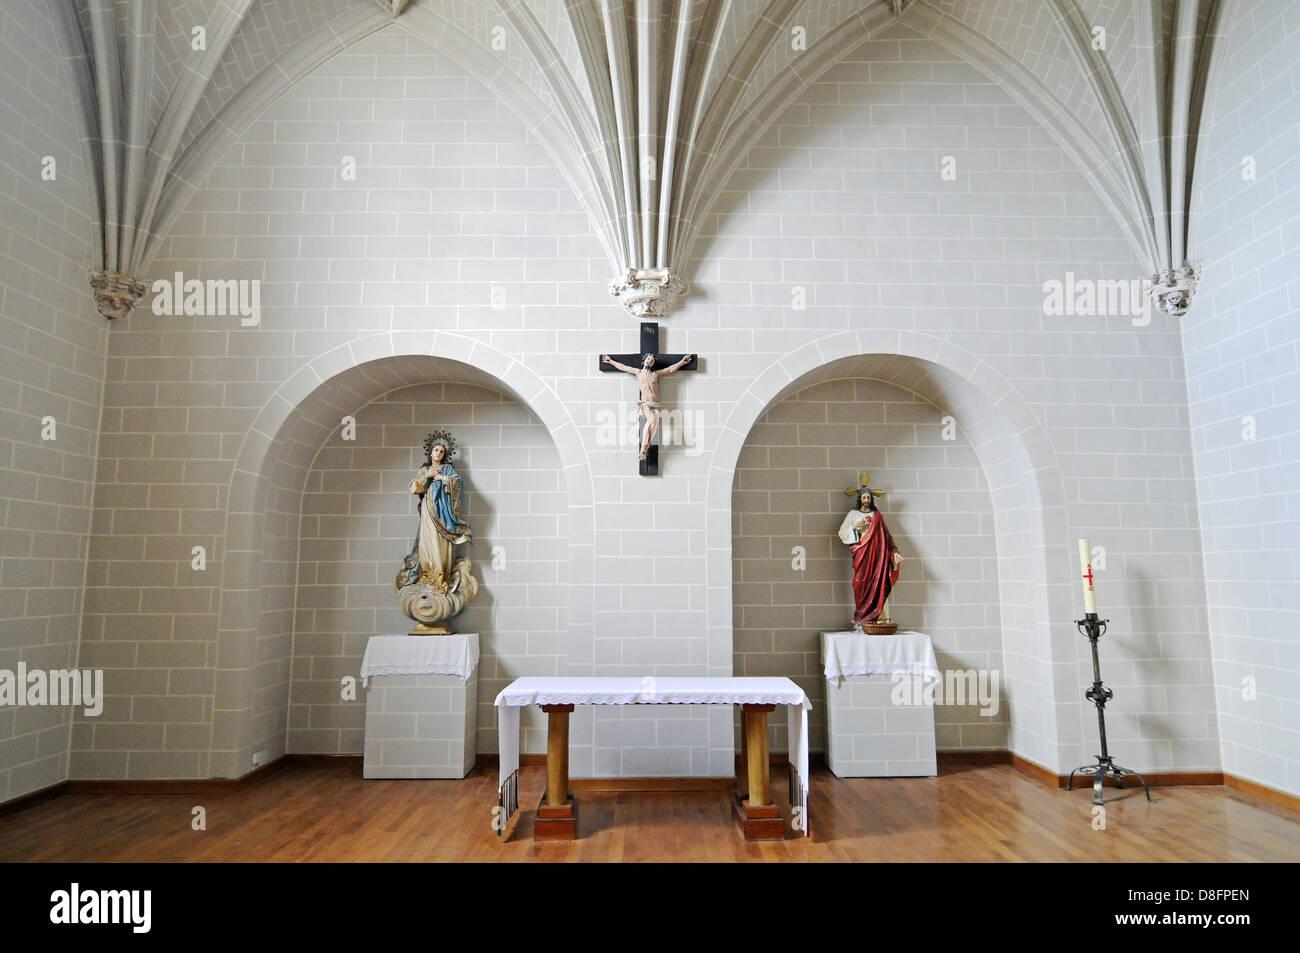 Monasterio de Santa Maria la Real de Irache Stock Photo